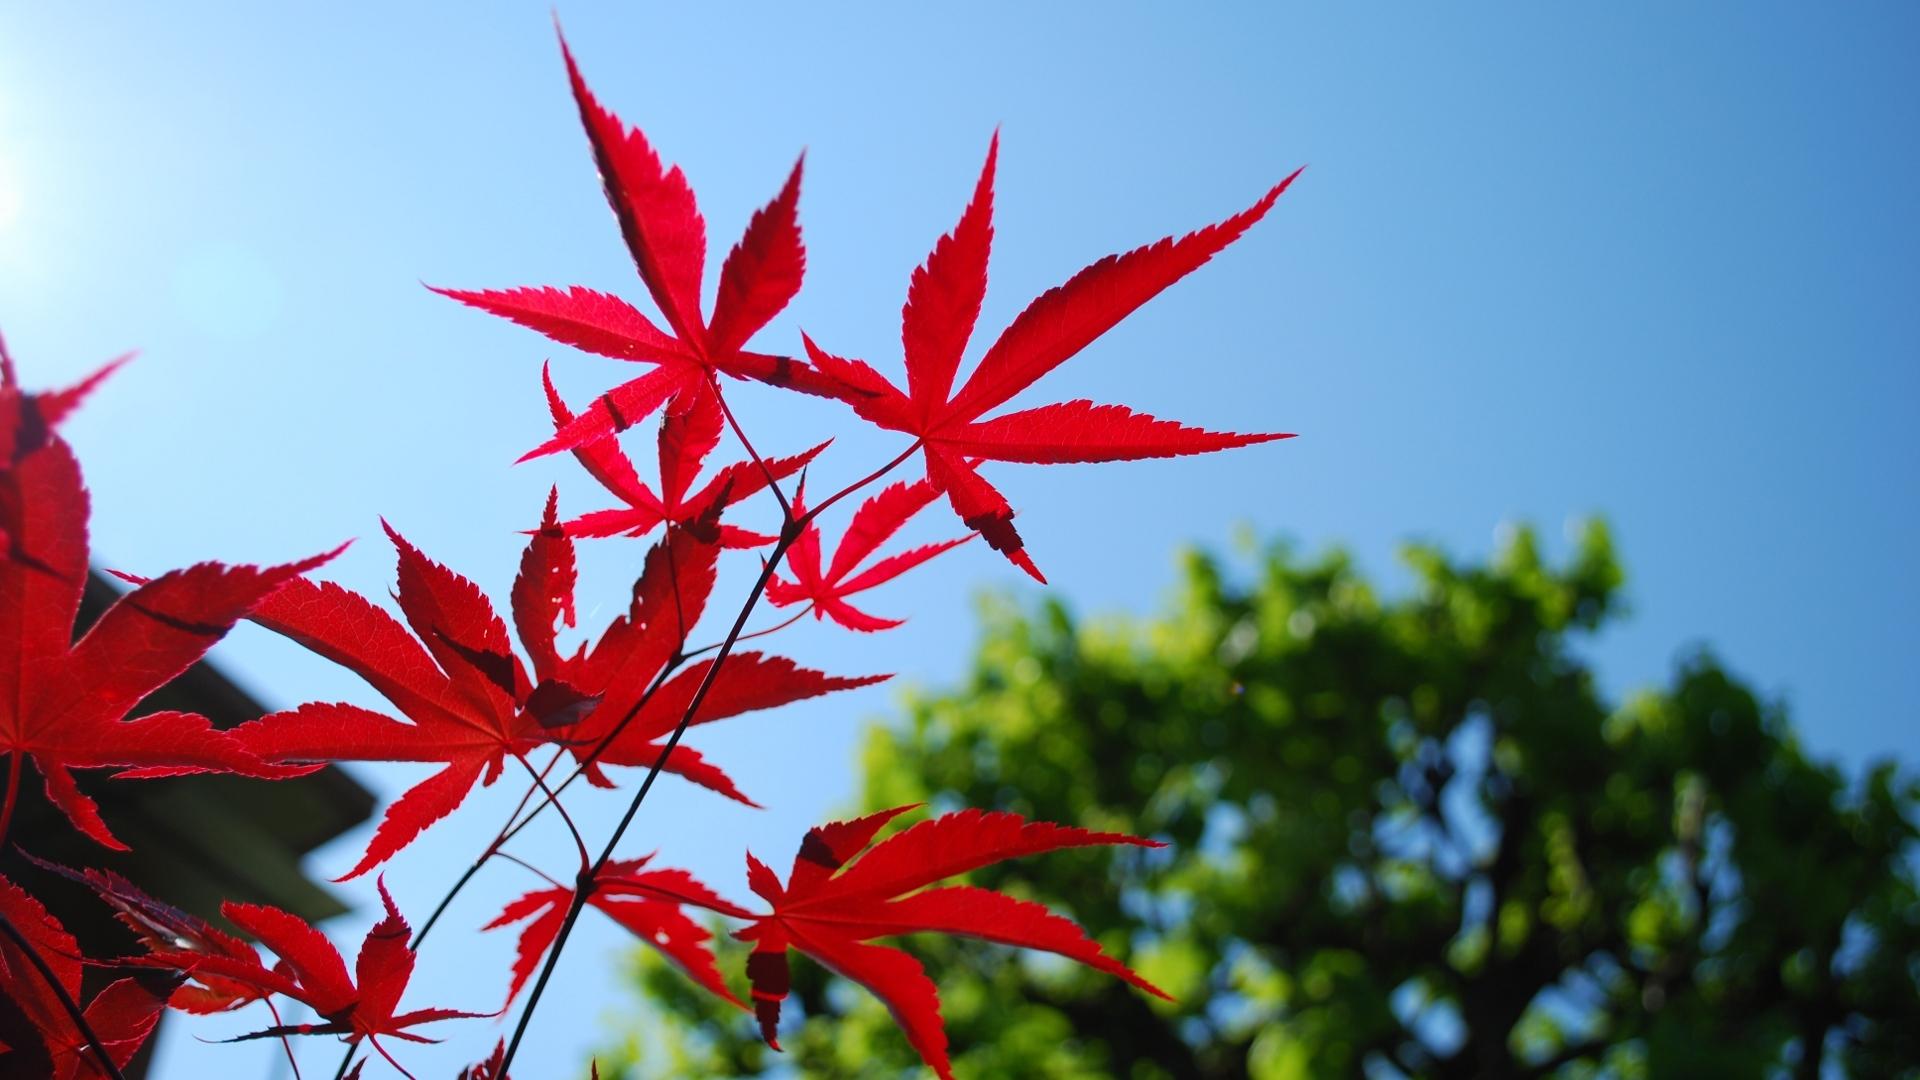 fond d'écran : des arbres, feuilles, rouge, ciel, branche, bleu